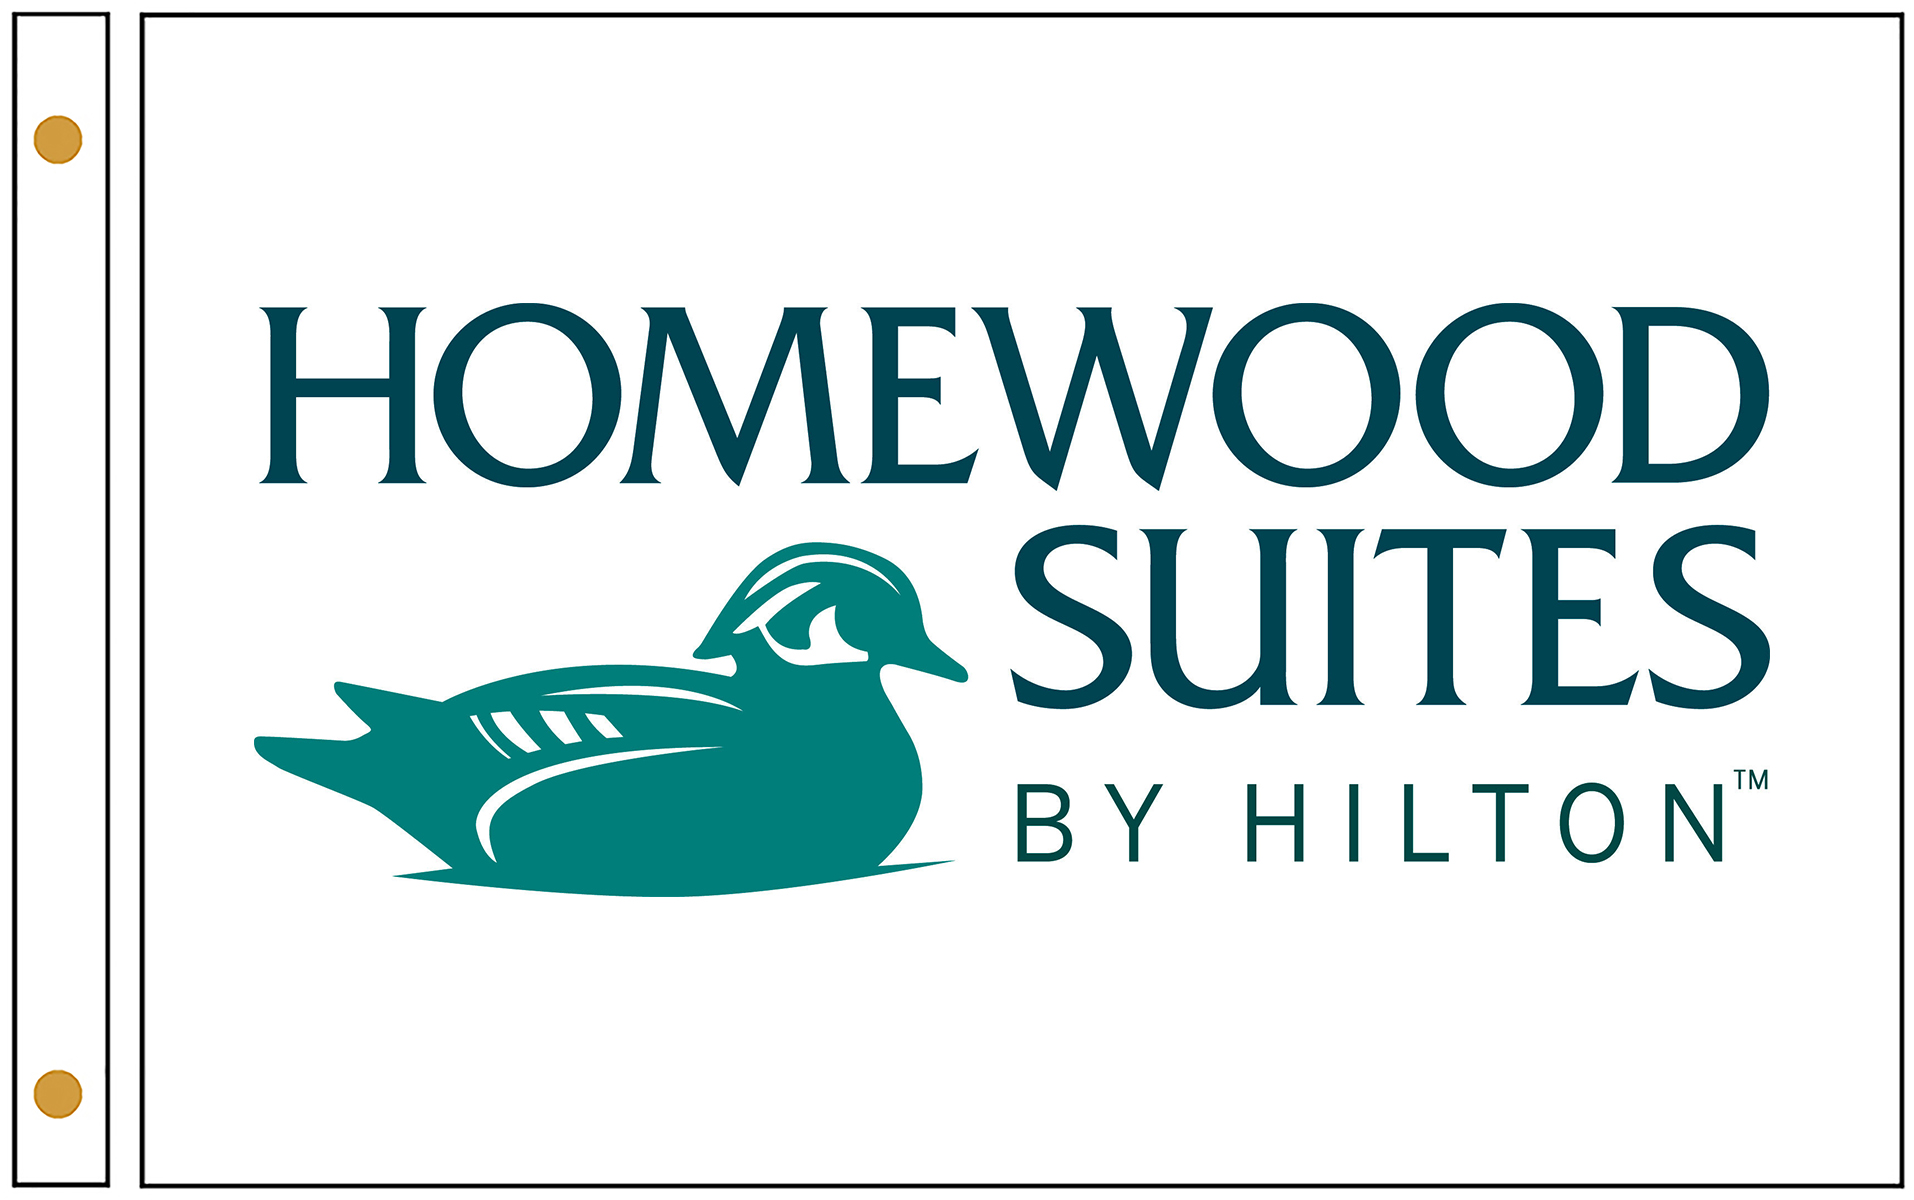 Hilton Homewood Suites Hotel Flags